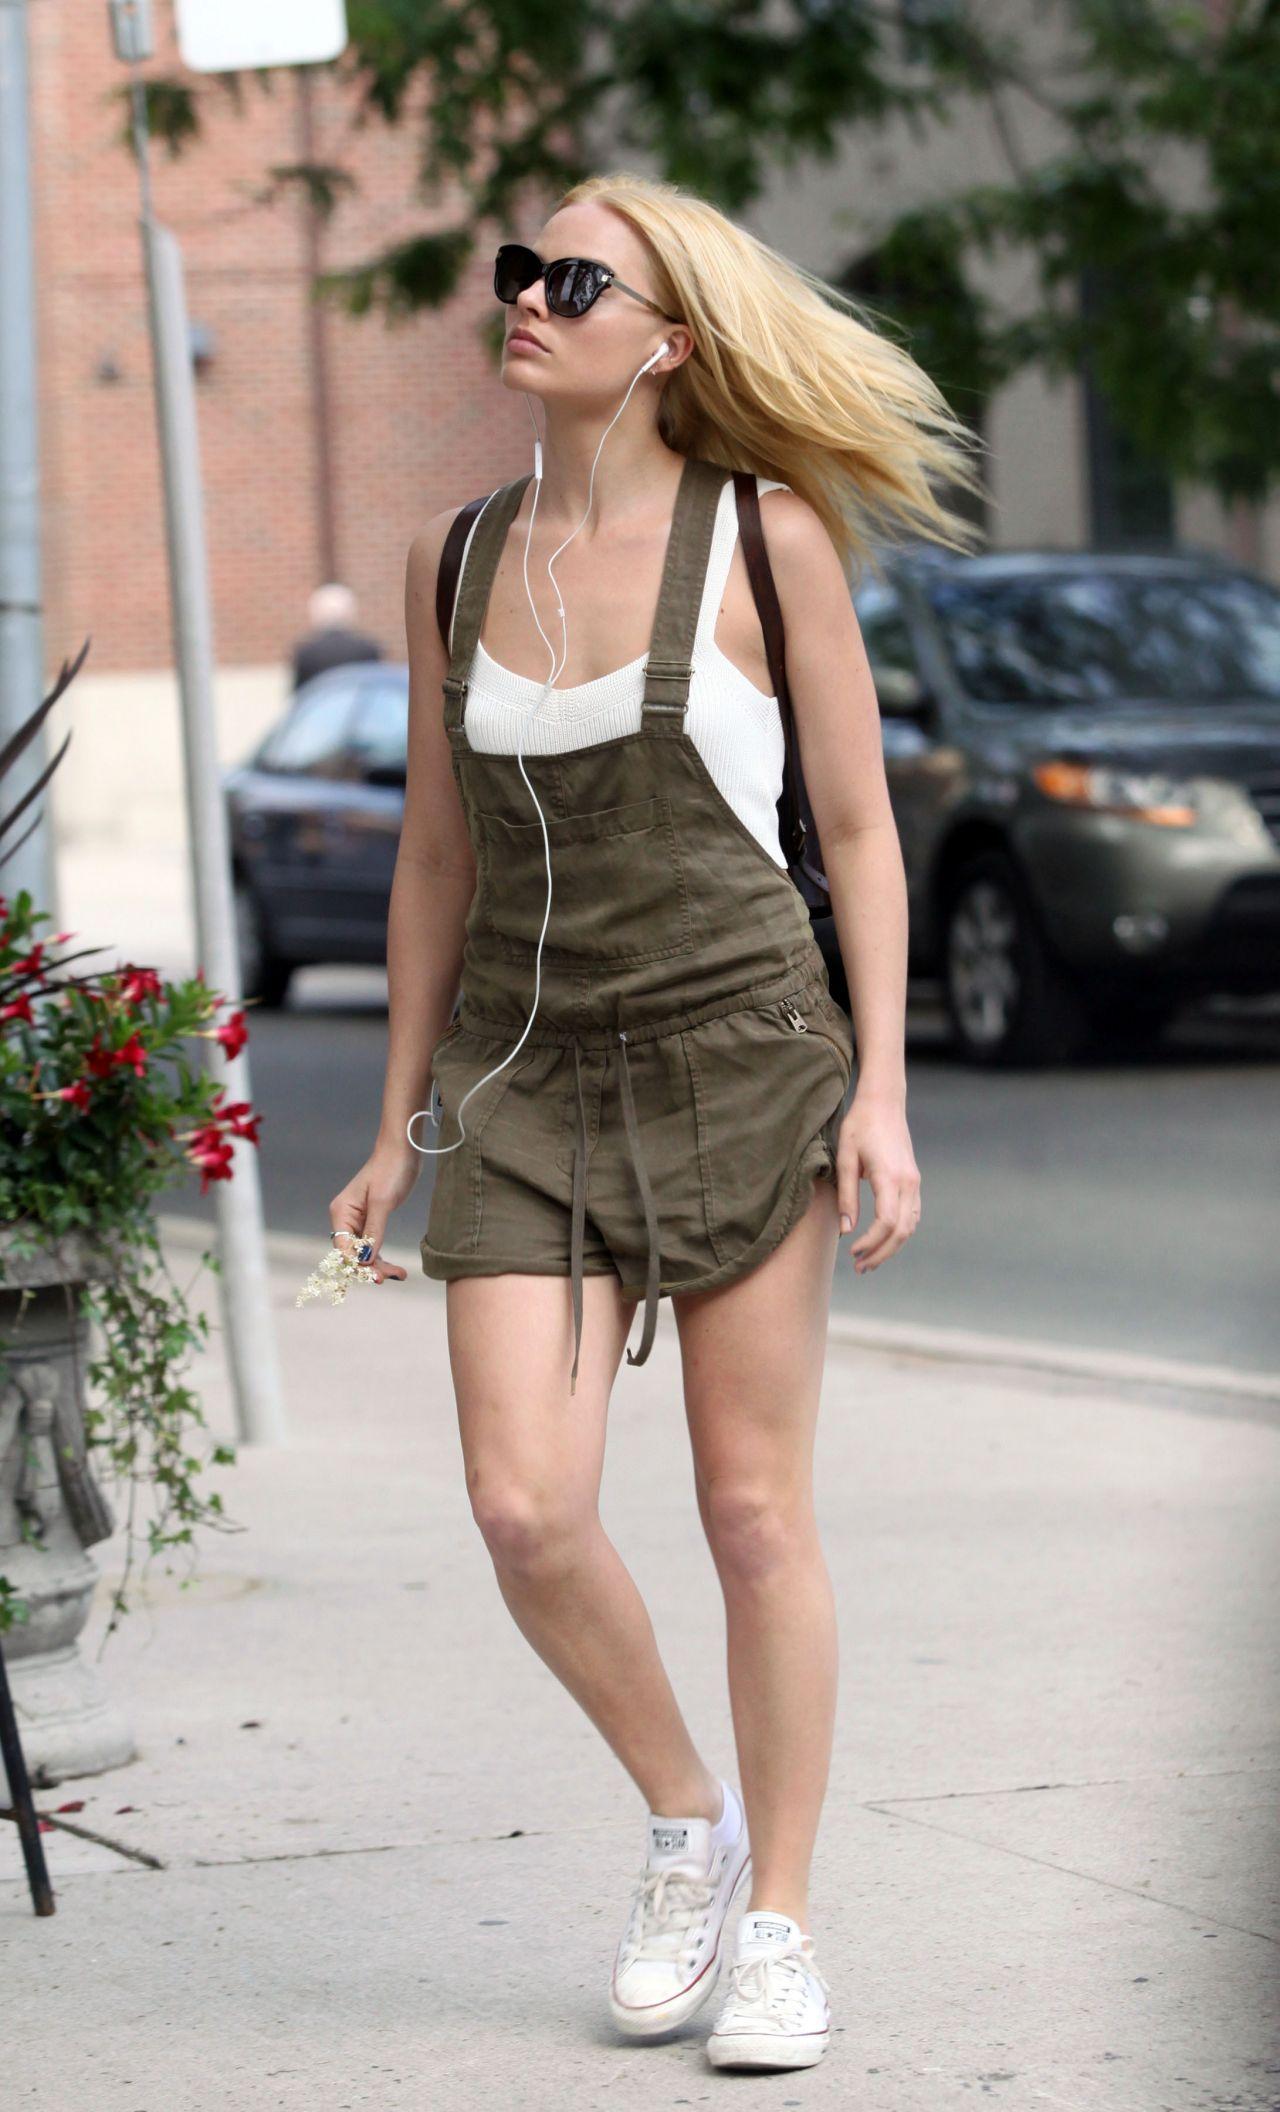 Margot Robbie Street Style Out In Toronto Canada June 2015 Margot Robbie Outfit Margot Robbie Style Margot Robbie